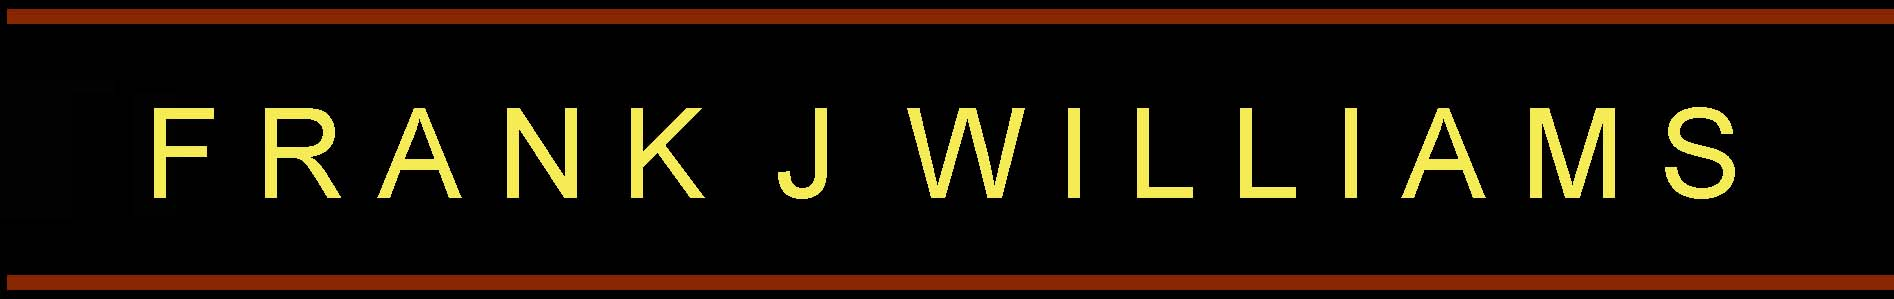 LogoFullWidth-FrankWilliams.jpg